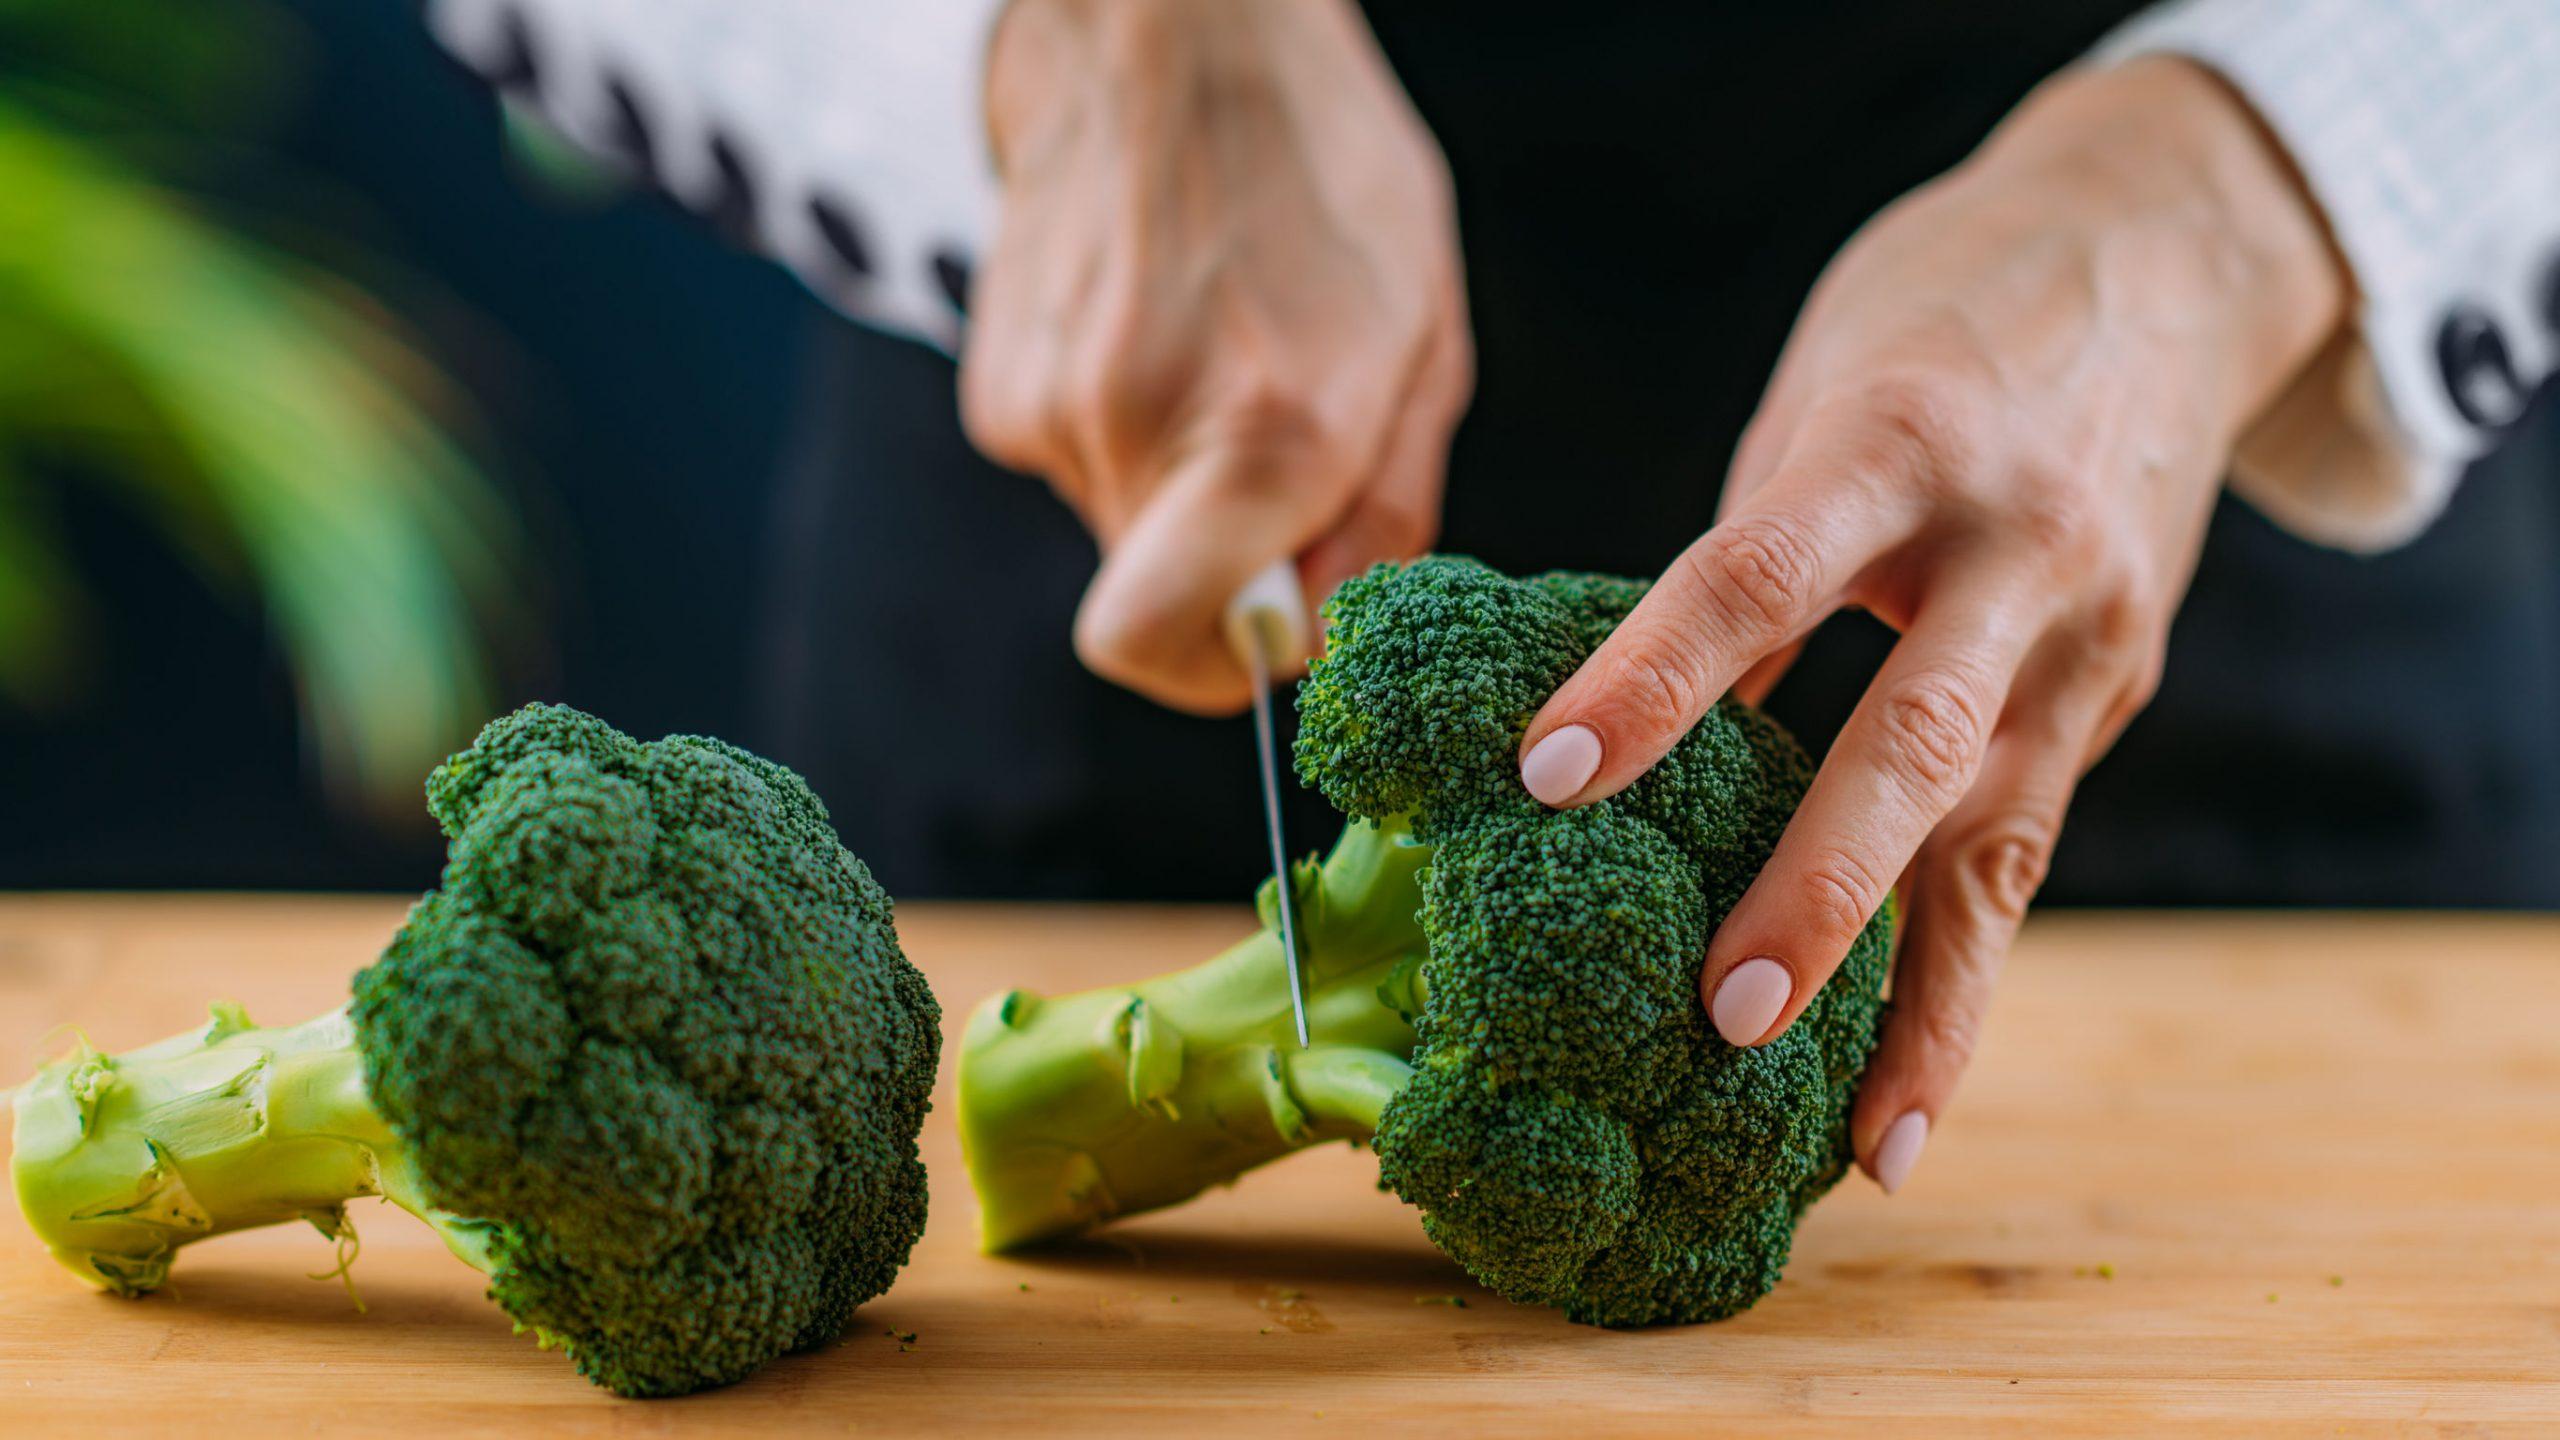 superalimento rico en vitamina K, vitamina C, ácido fólico, potasio, fitonutrientes y fibras